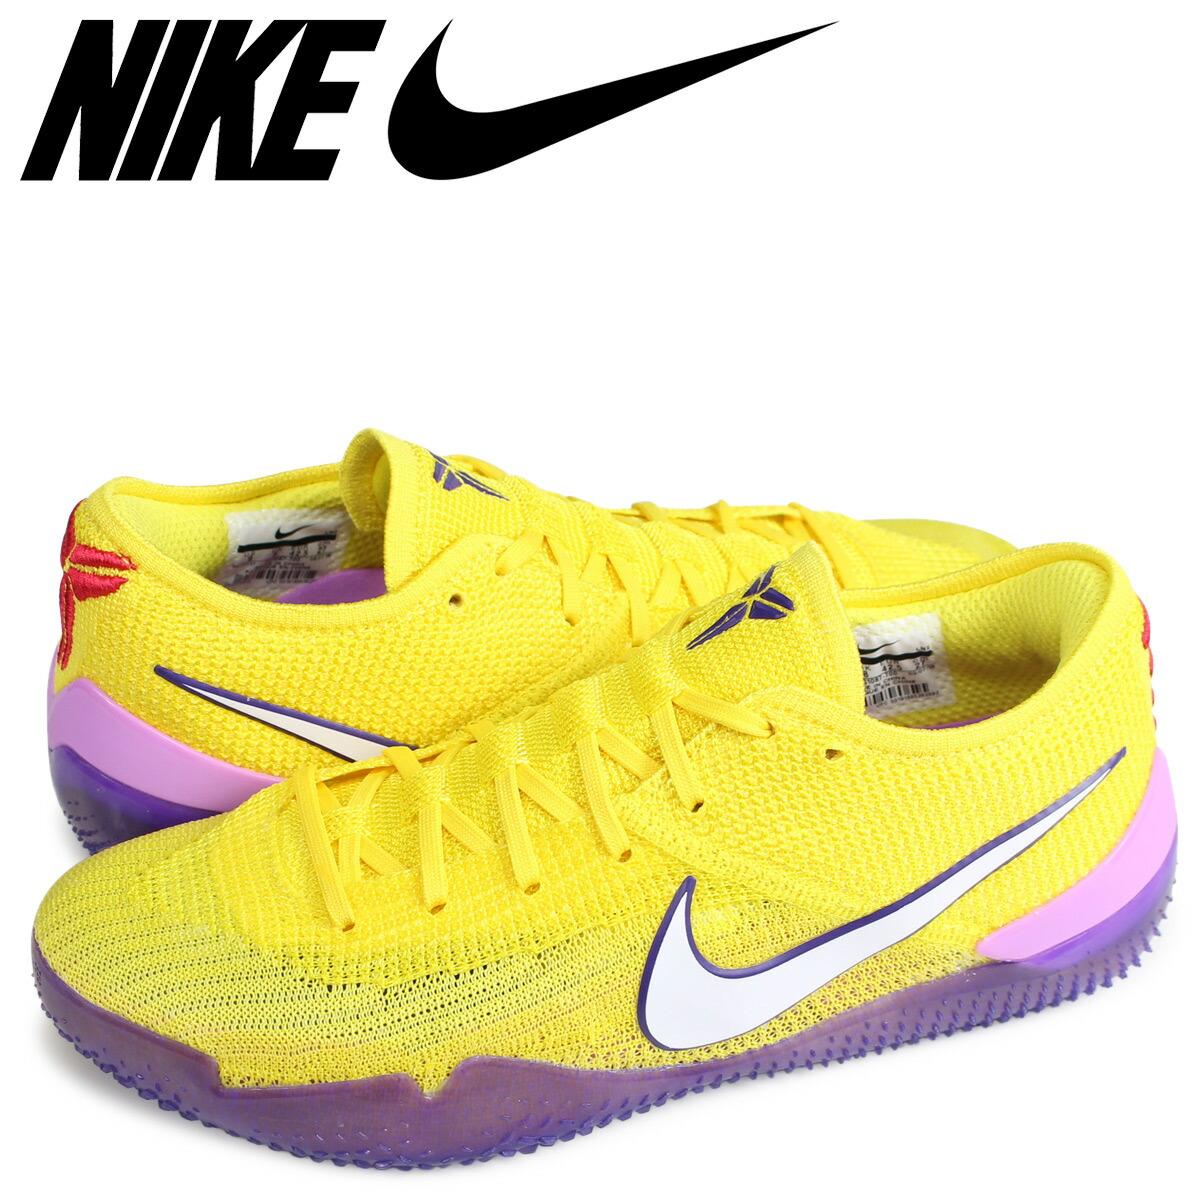 online store cdcfb f1efd NIKE KOBE AD NXT 360 YELLOW STRIKE Nike Corby sneakers men AQ1087-700 yellow